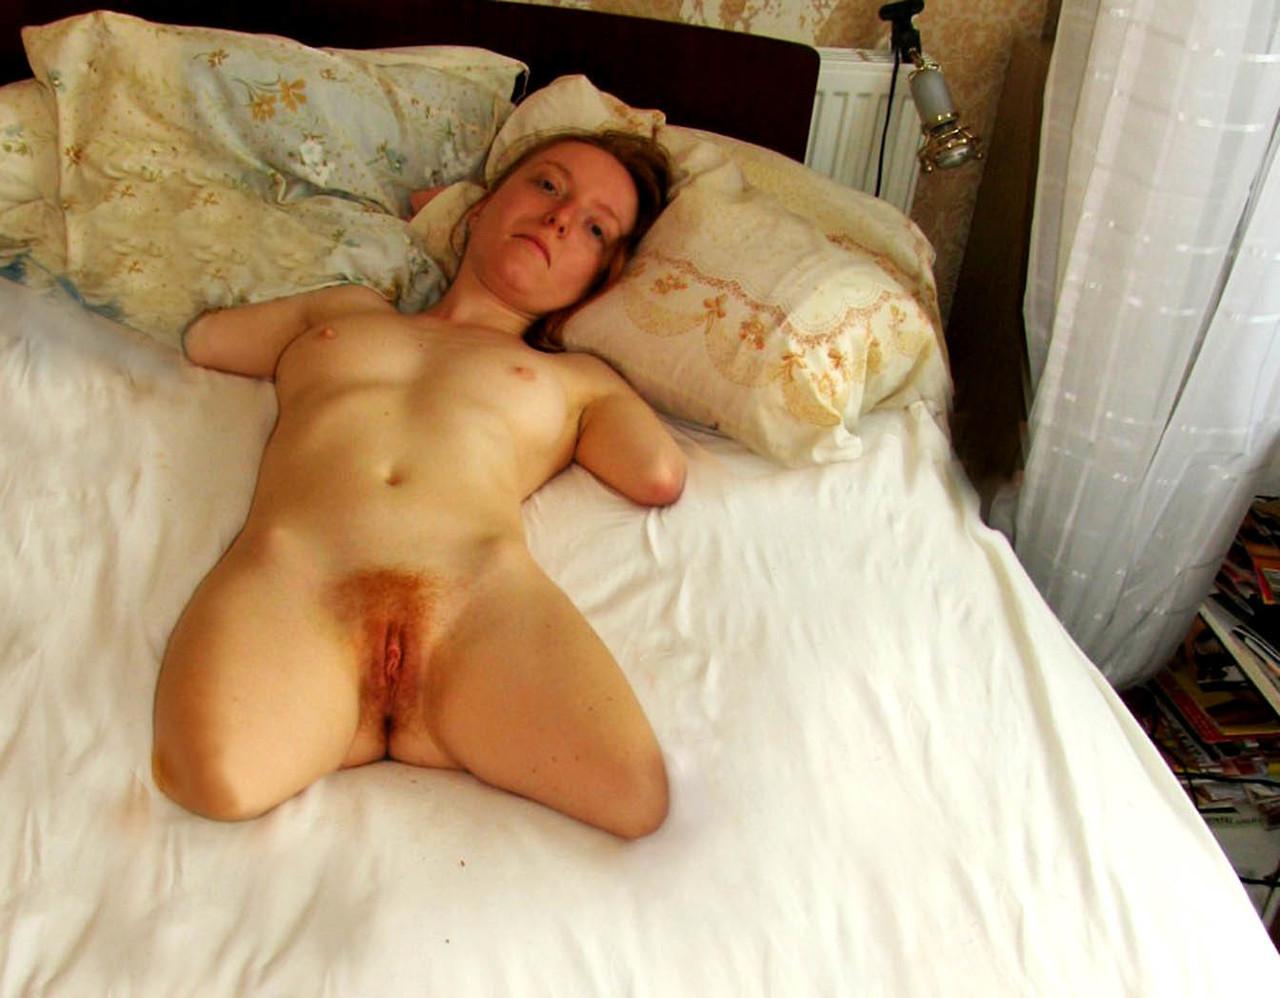 Female amputee porn